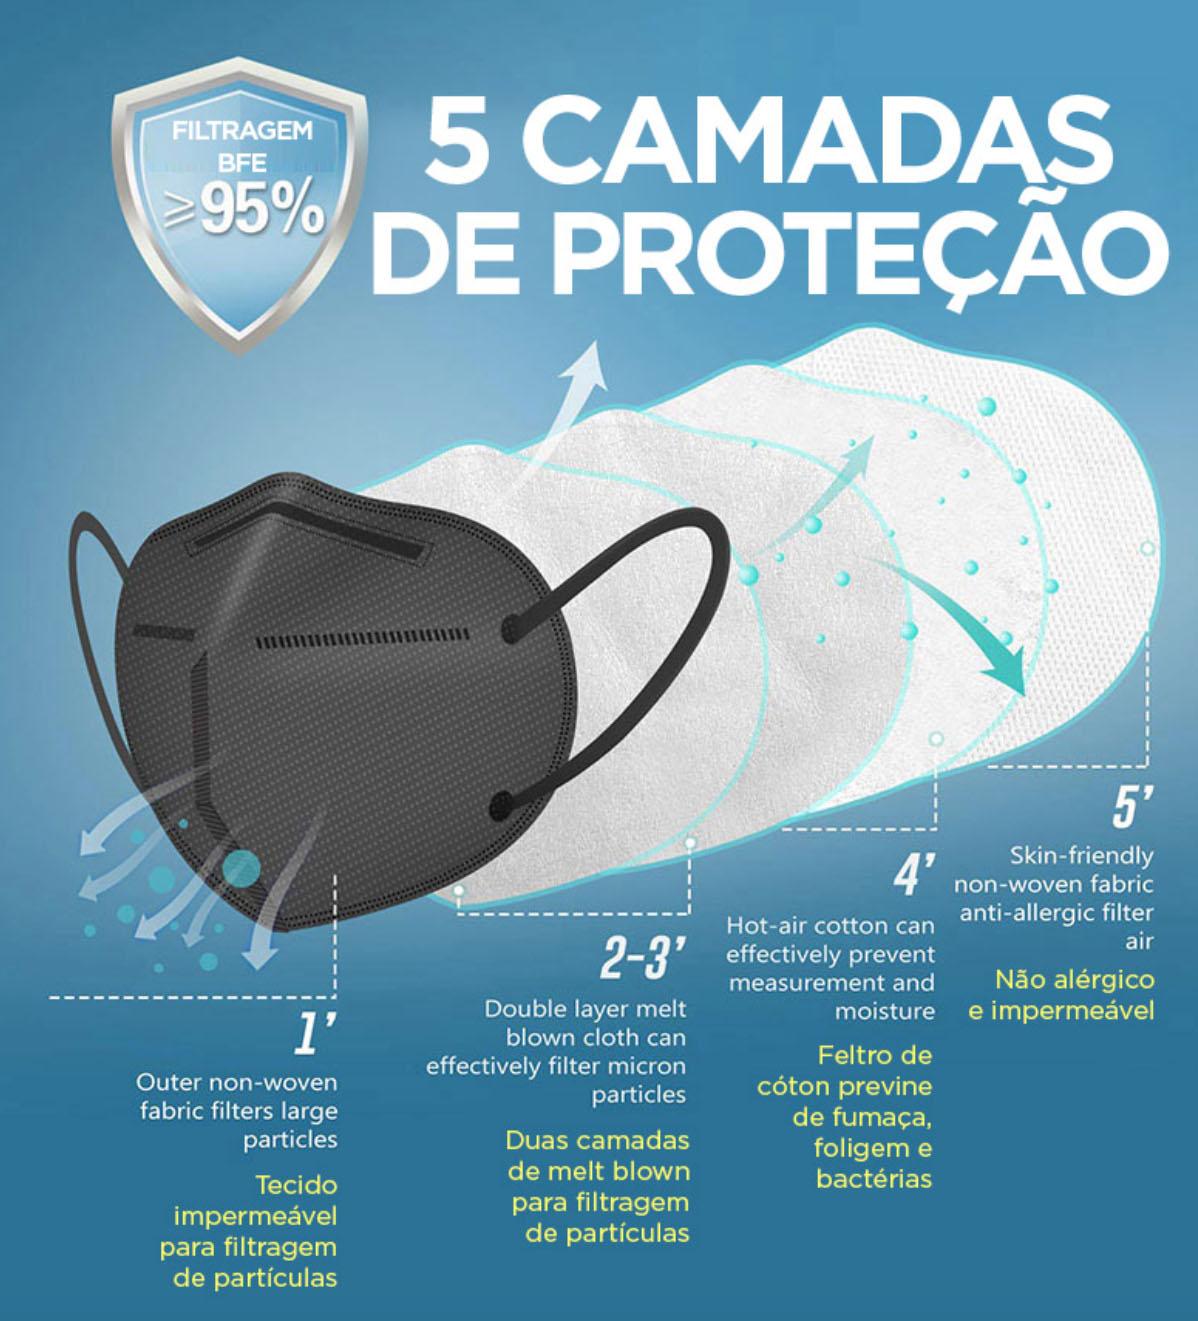 Máscara PFF2 / N95 / KN95 adulto preta - pacote 30 unidades 5 camadas meltblow BFE 98% + feltro de coton + tnt spunbond hospitalar hipoalergenico